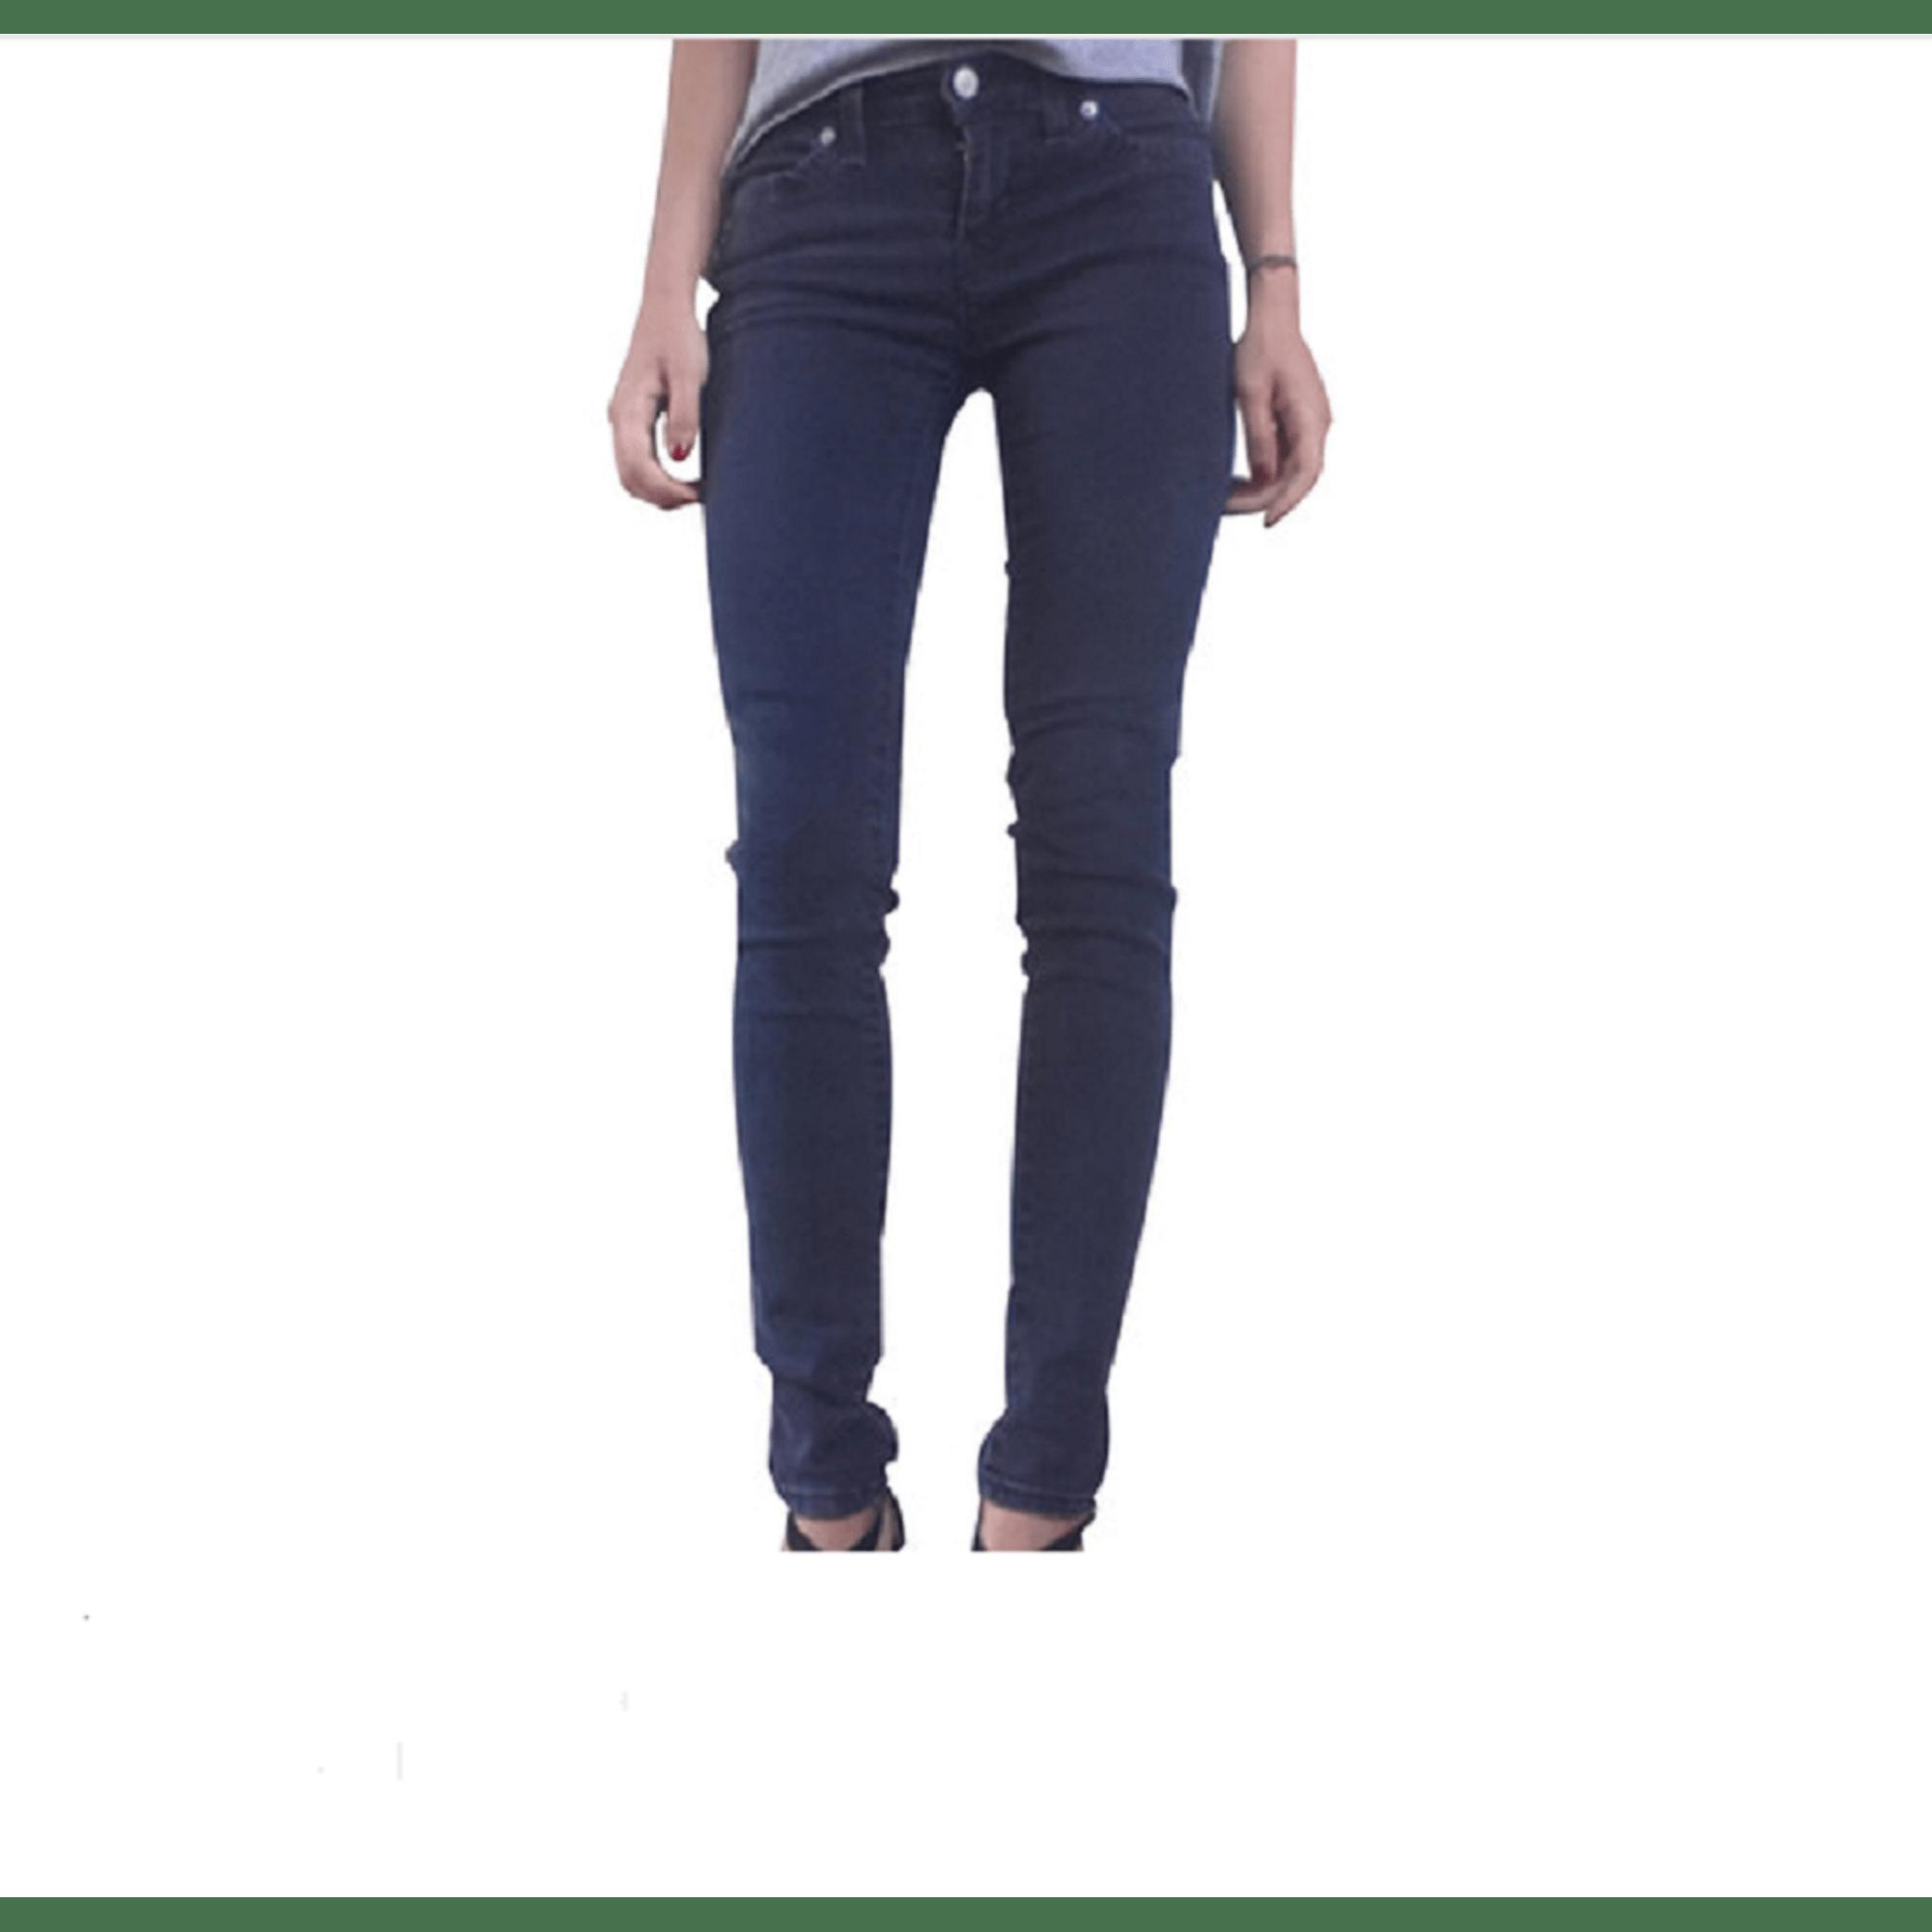 Straight Leg Pants LEVI'S Blue, navy, turquoise